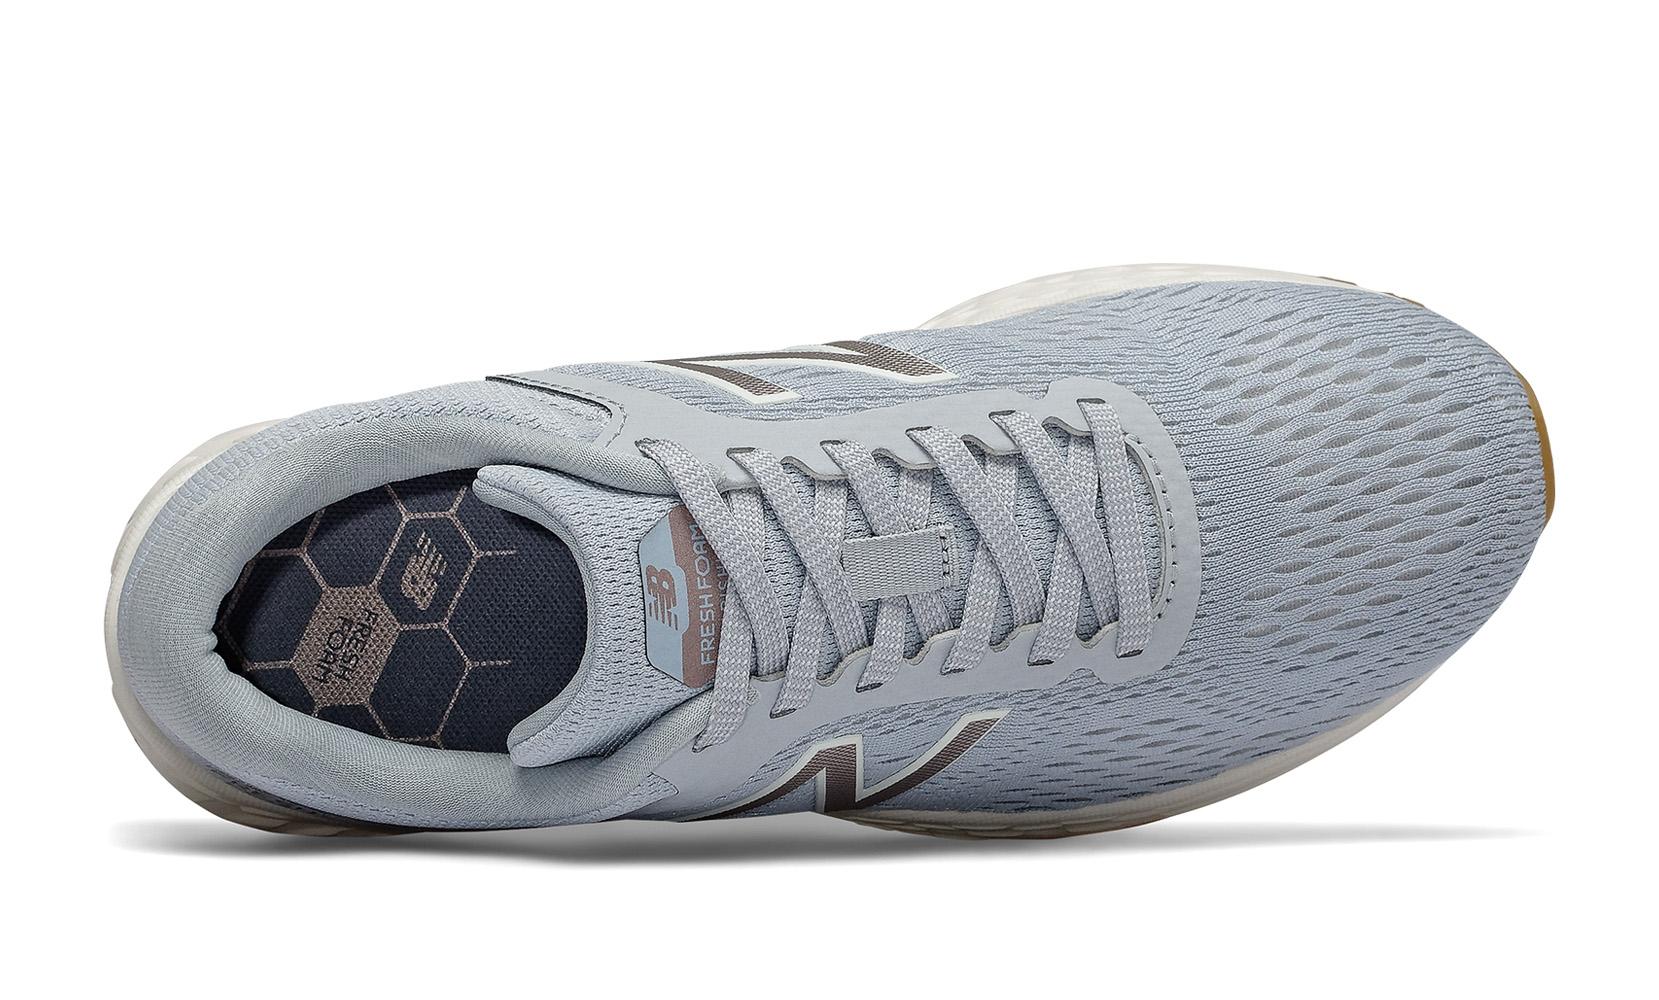 Жіноче взуття для бігу Fresh Foam Arishi V2 WARISRG2 | New Balance